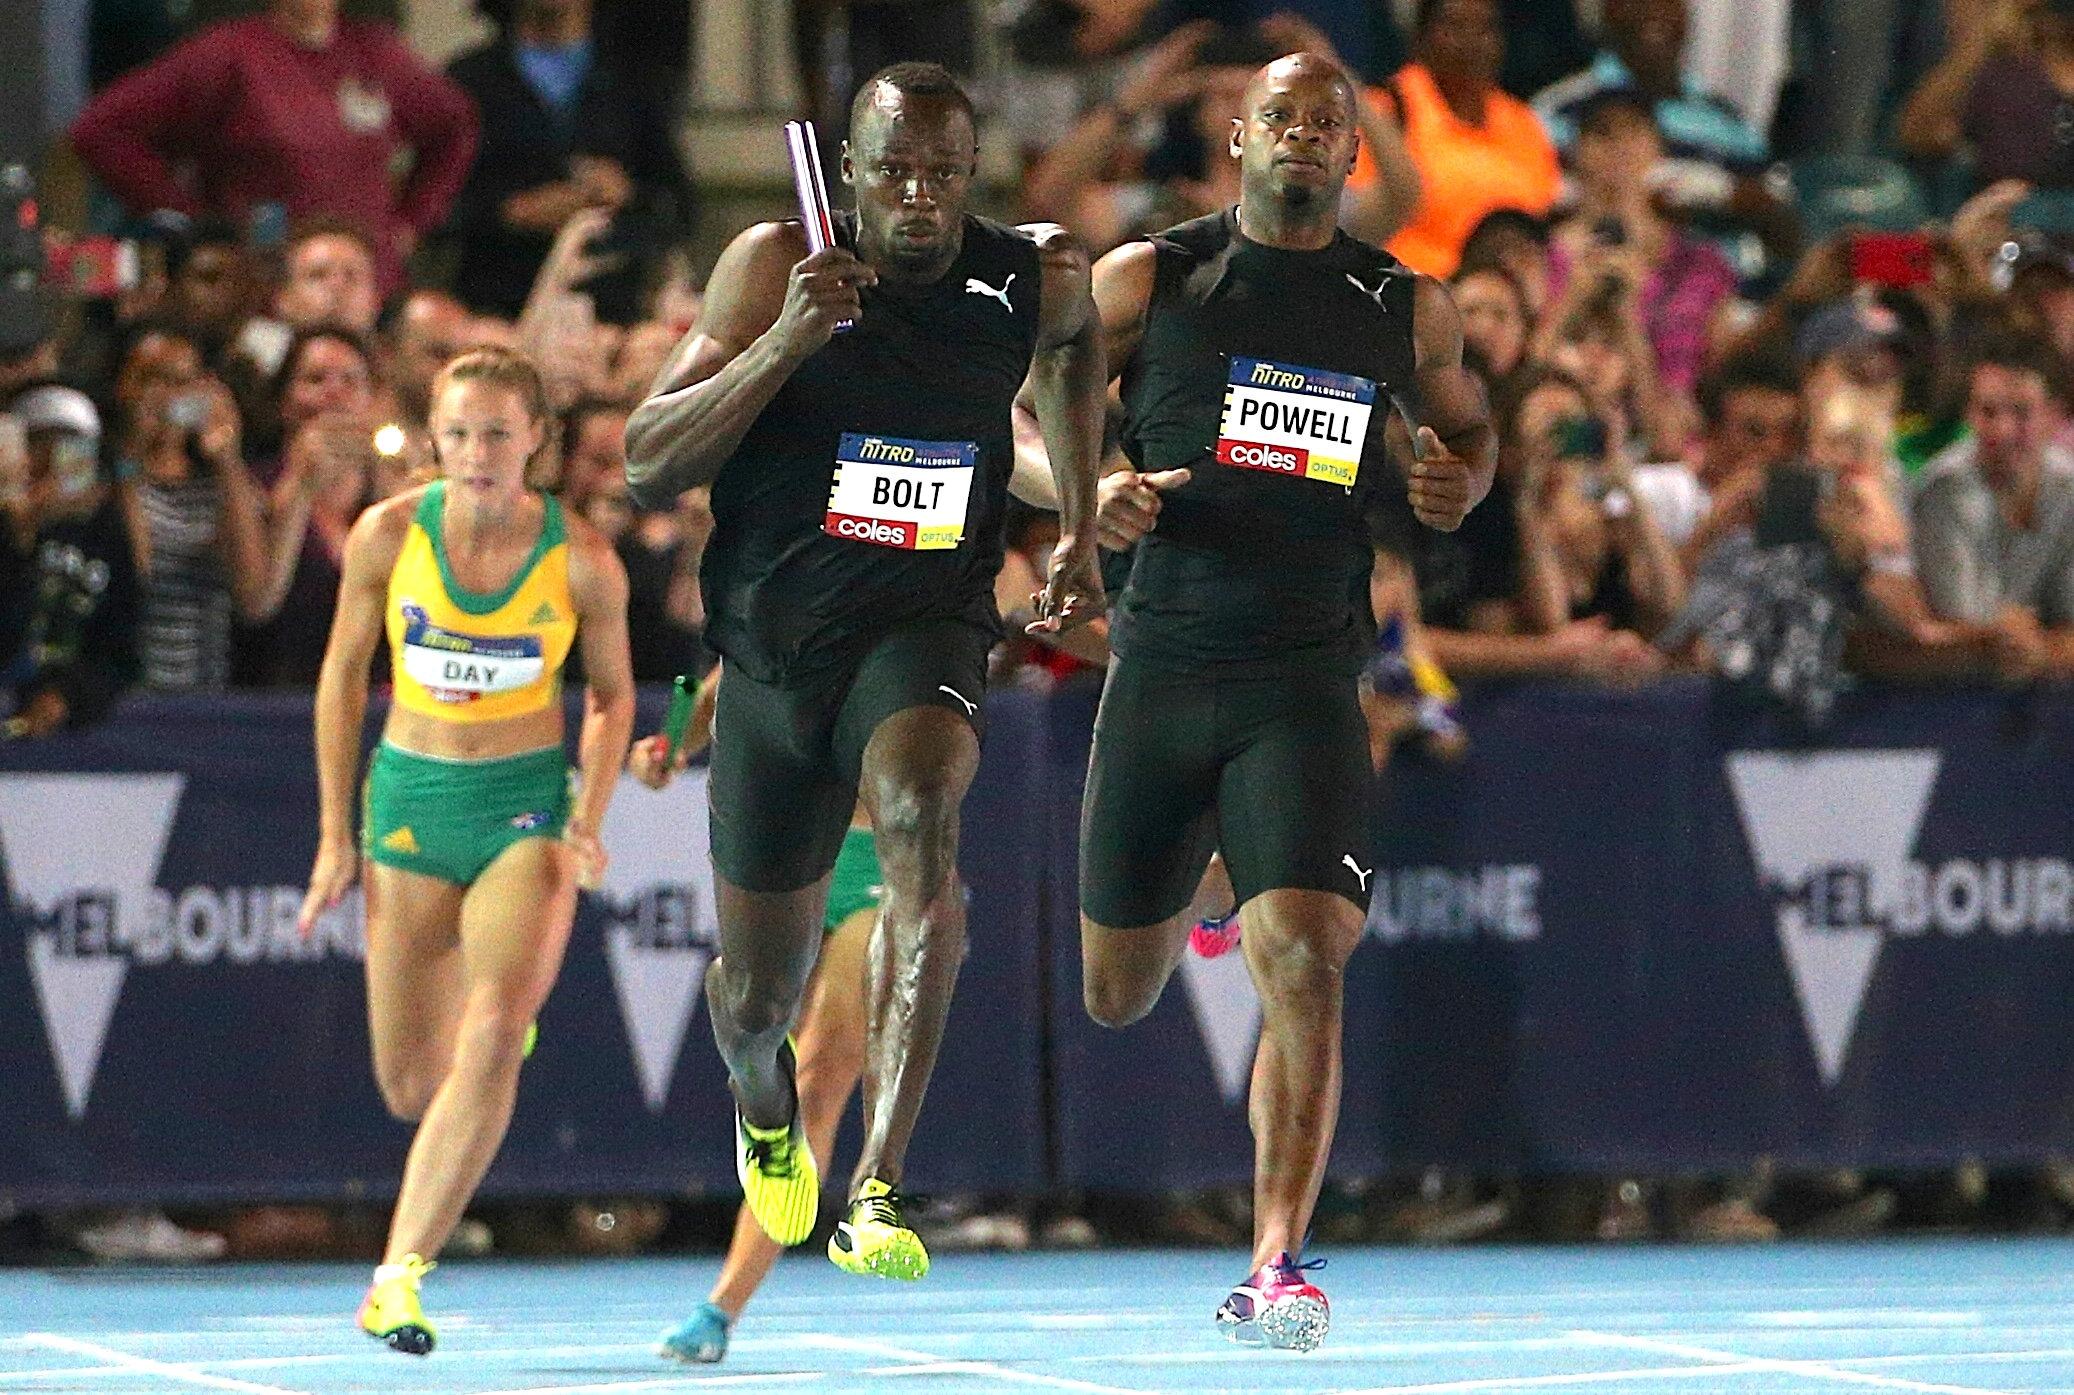 Athletics: Bolt sprinkles star-dust as athletics goes Hollywood